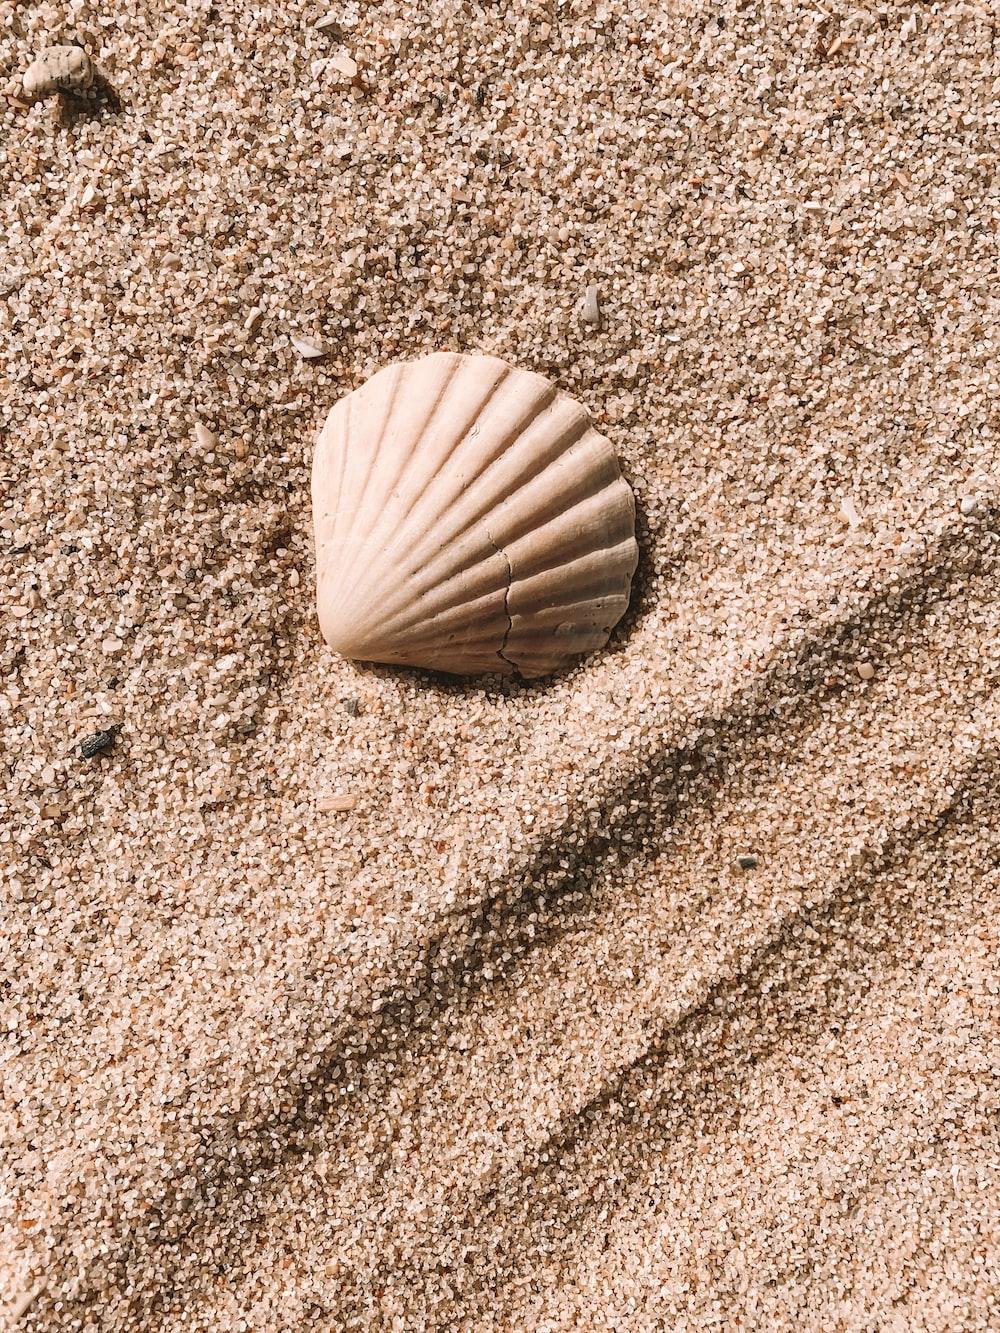 white seashell on sand